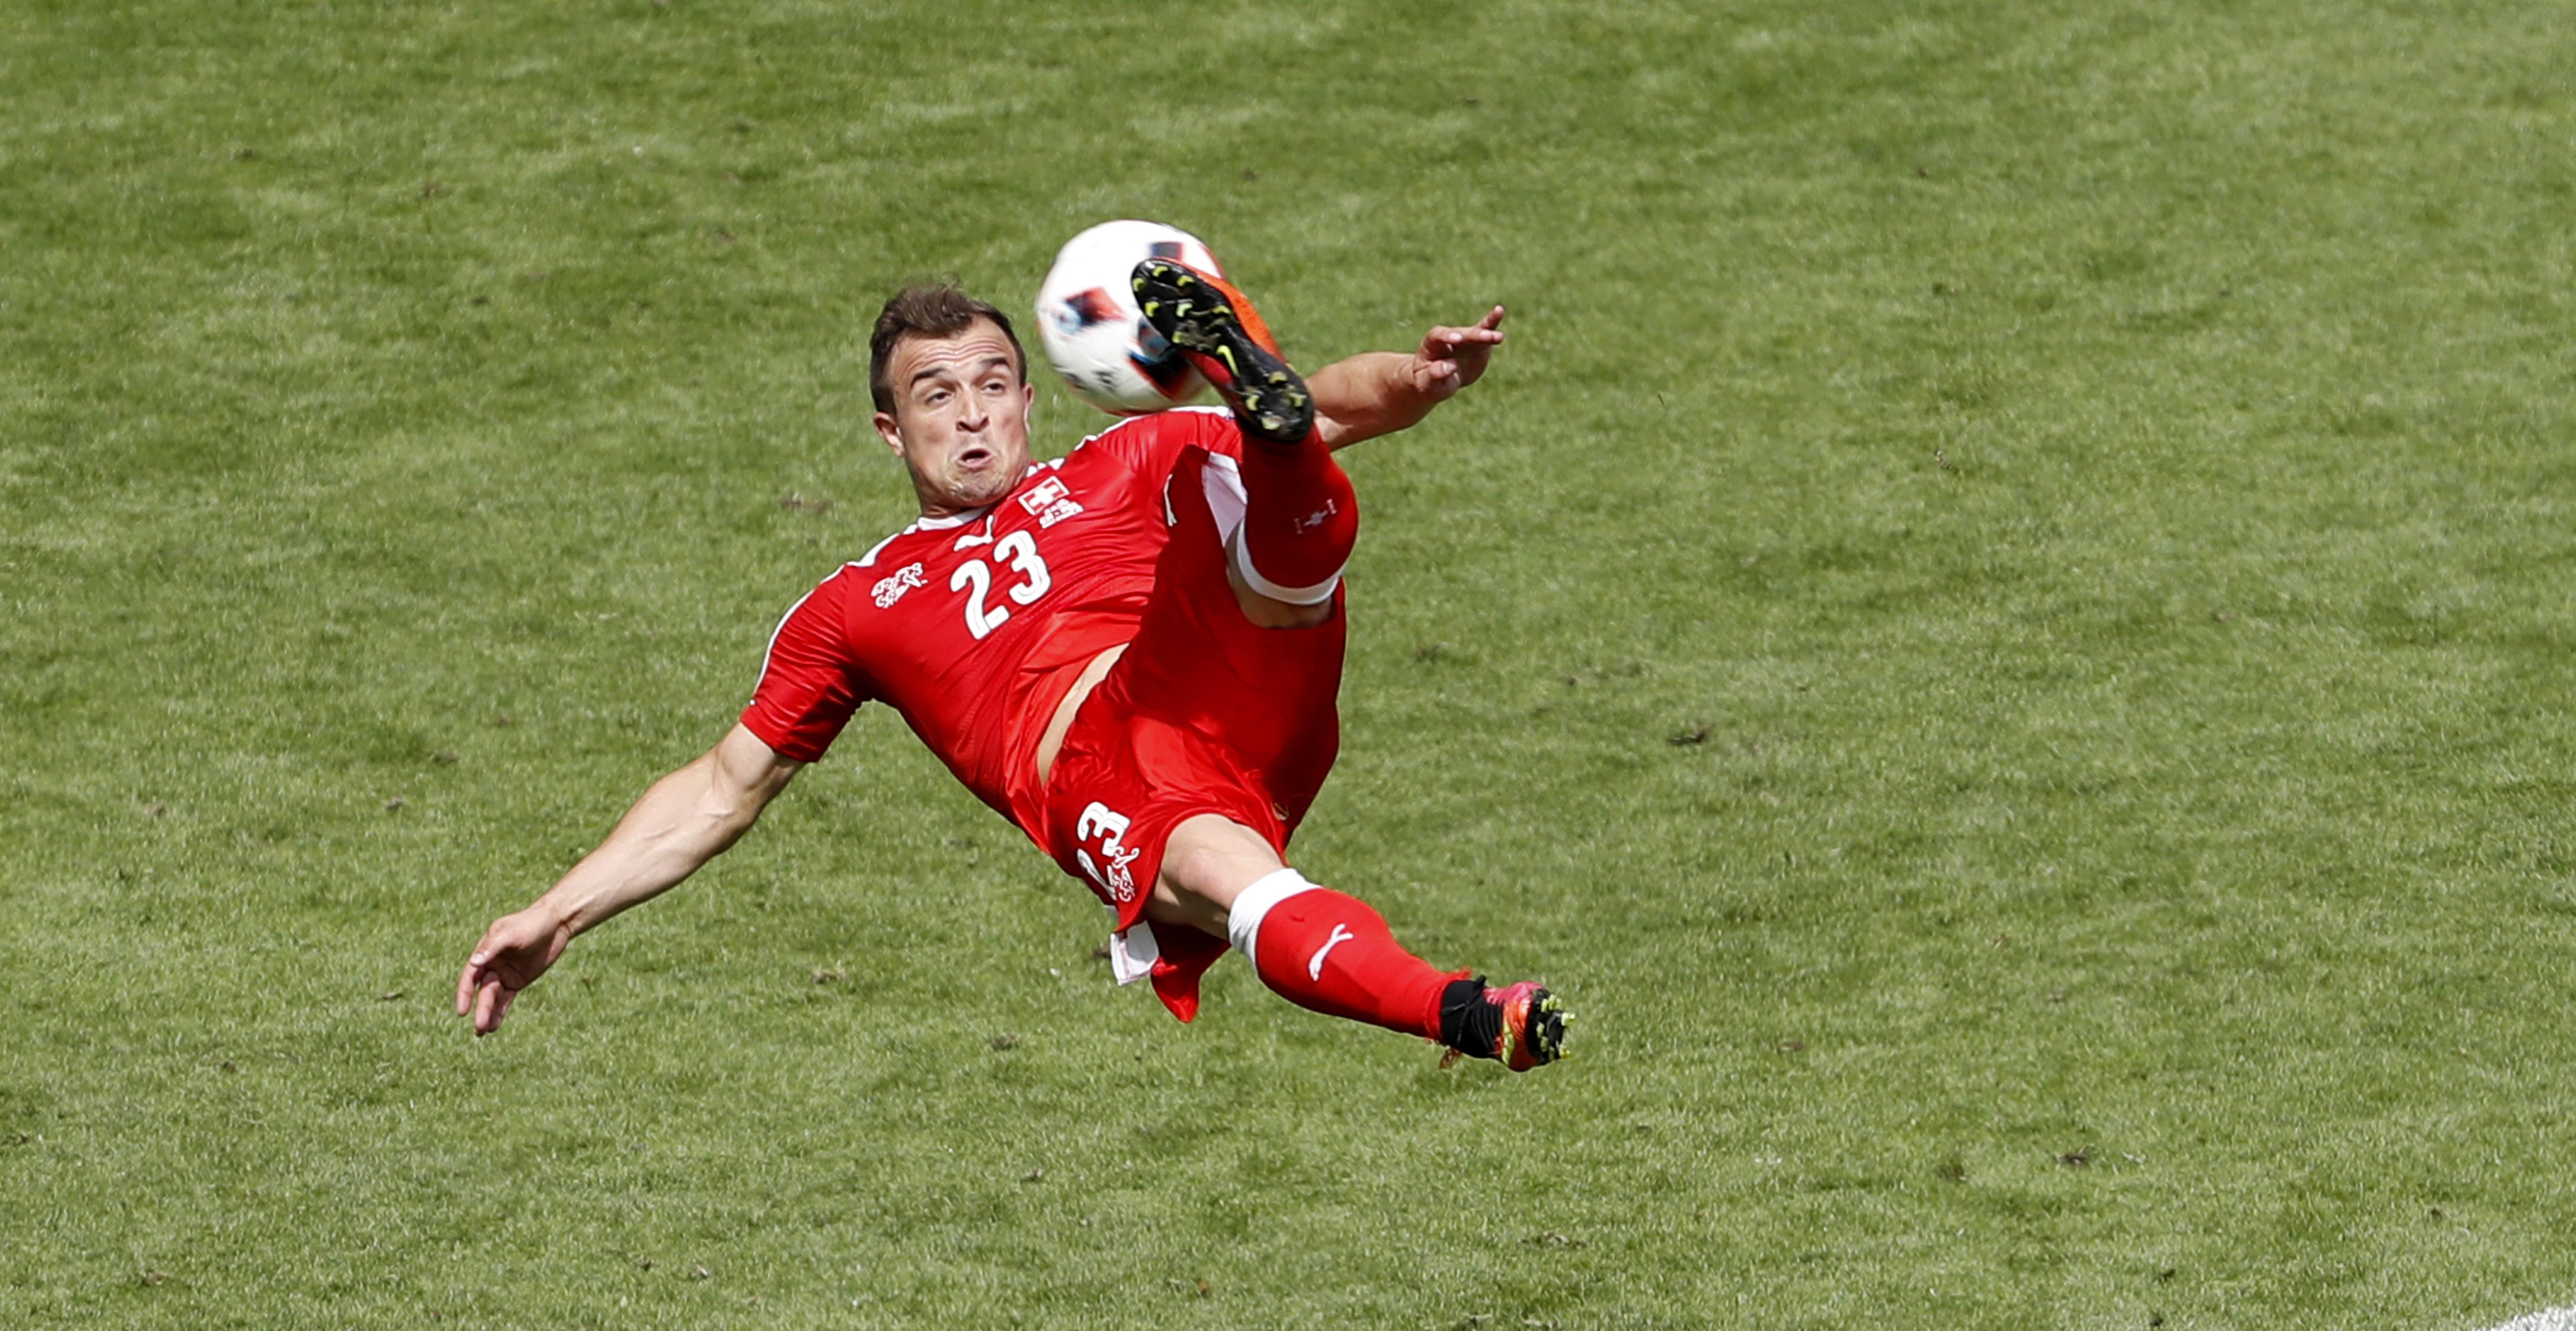 Euro 2016: Poland sink Swiss on penalties after brilliant Shaqiri goal